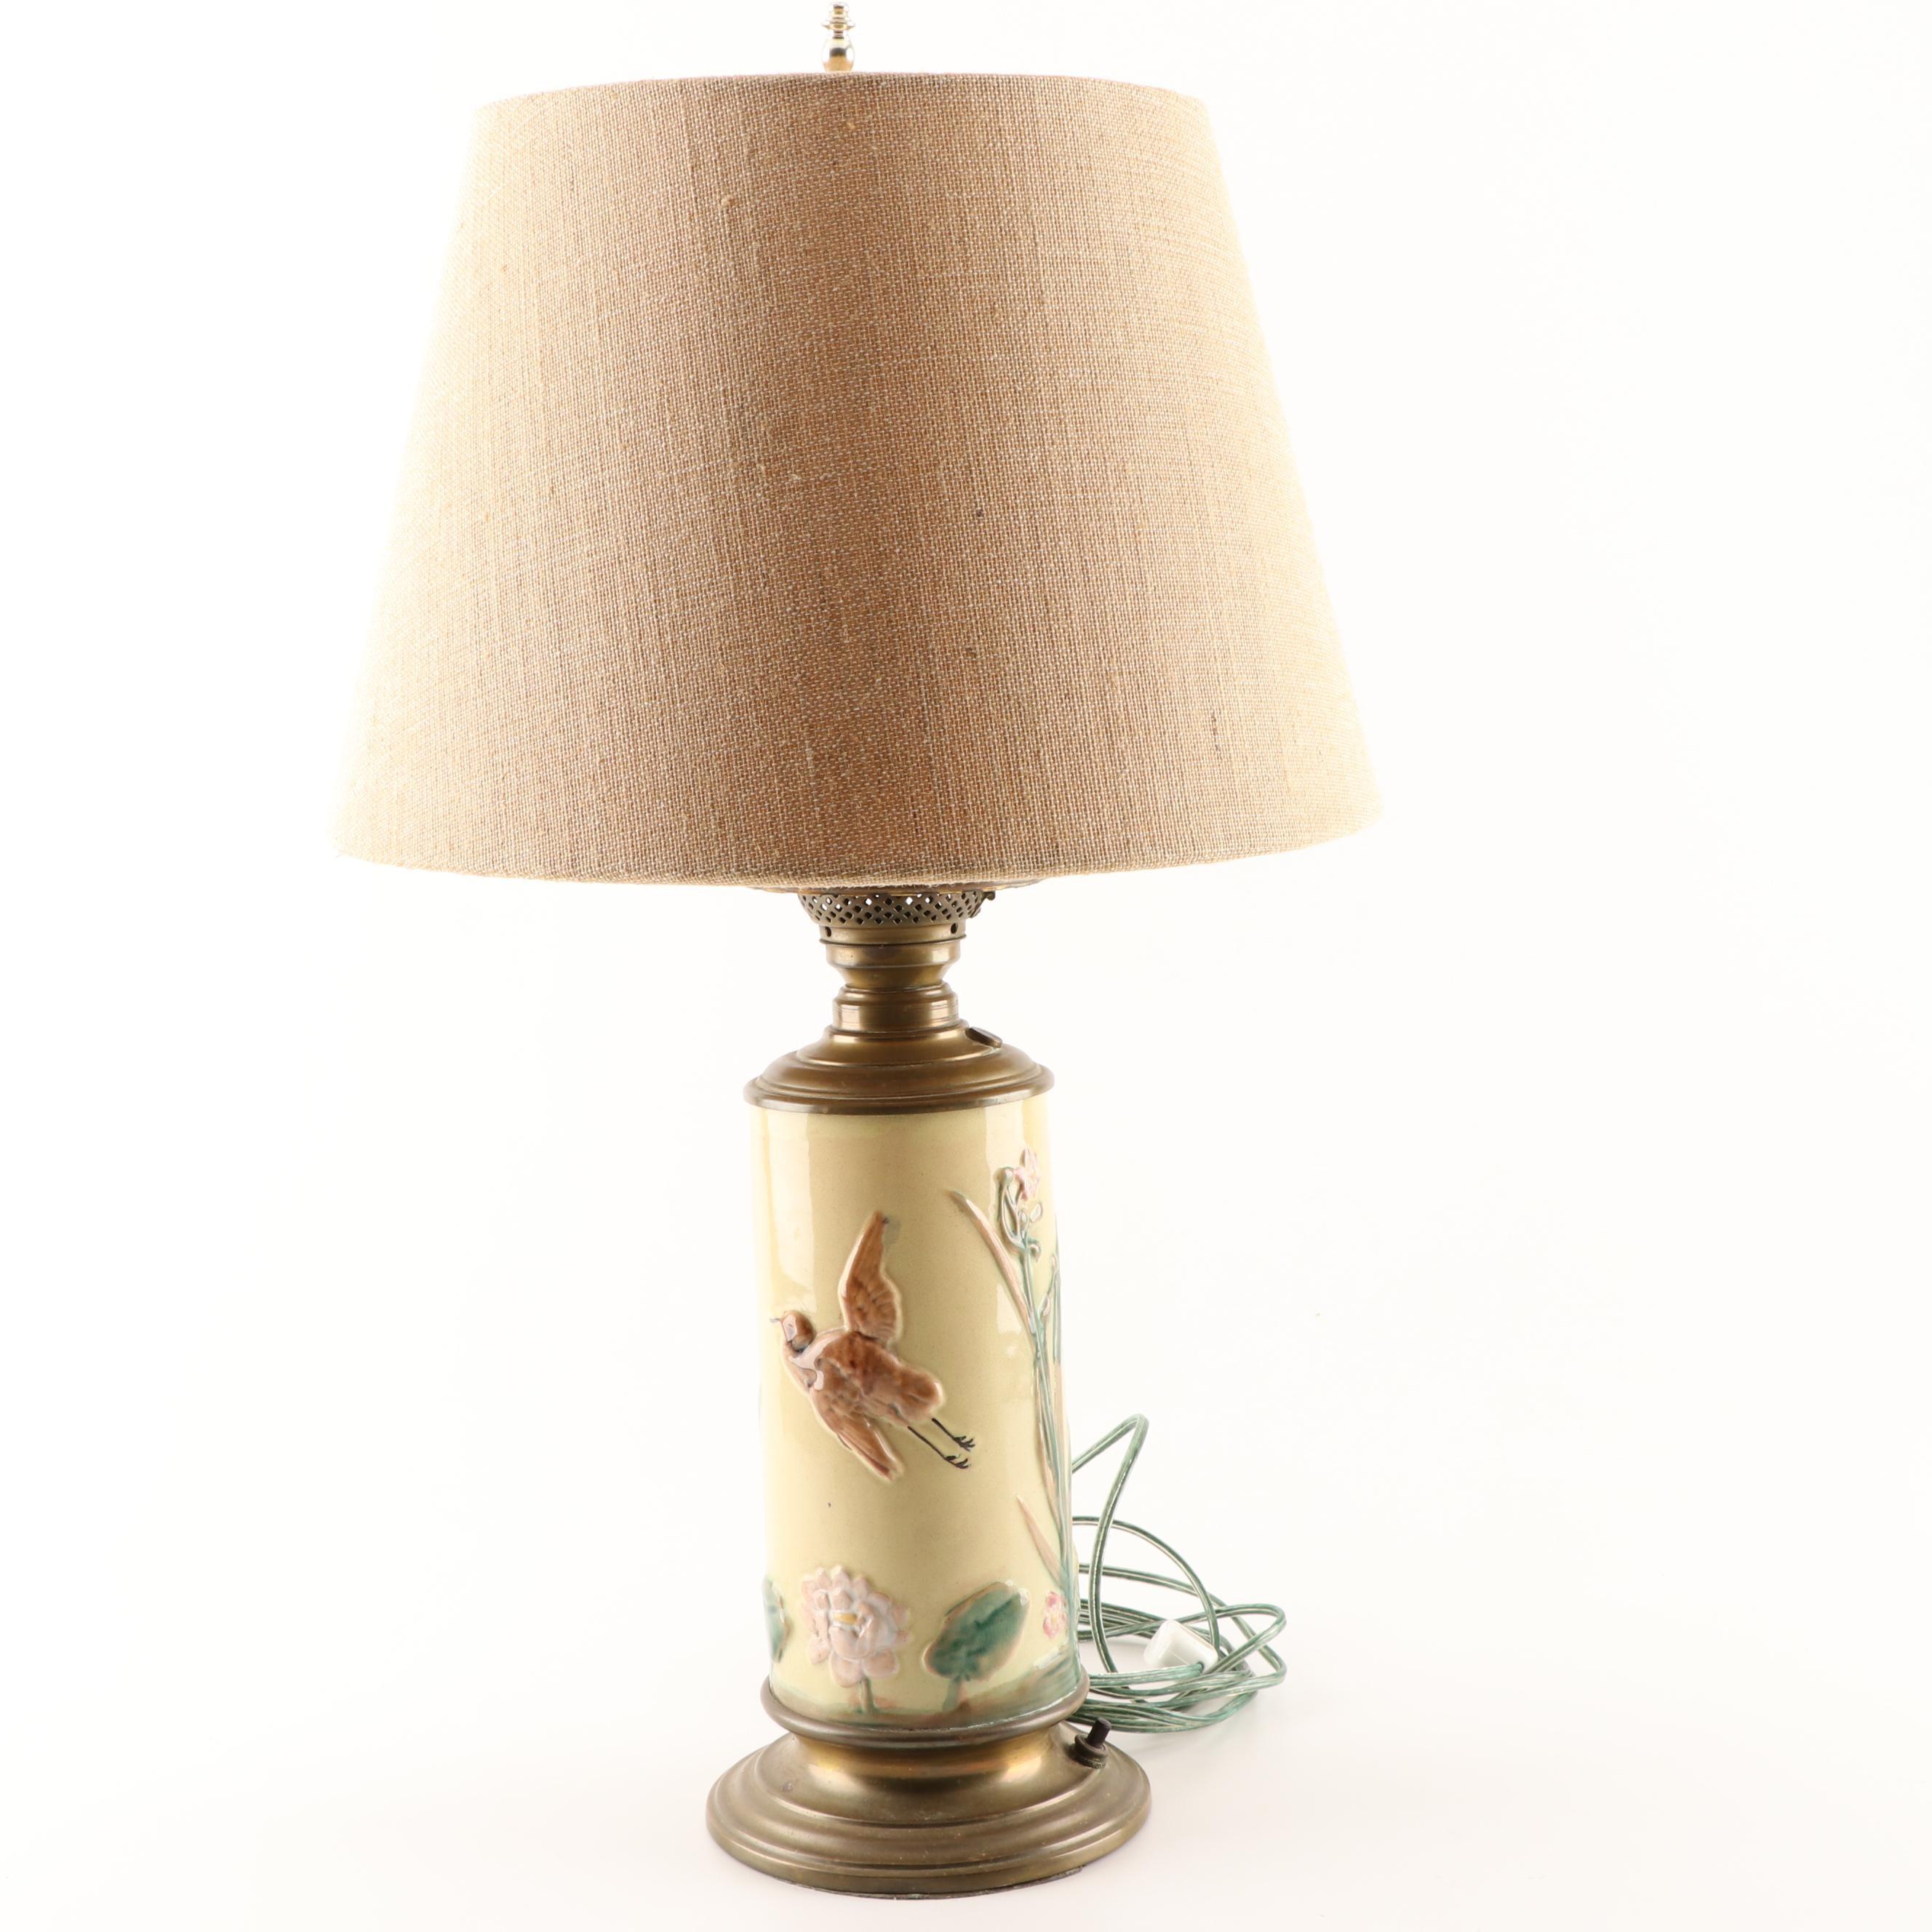 Majolica Table Lamp, circa 1950